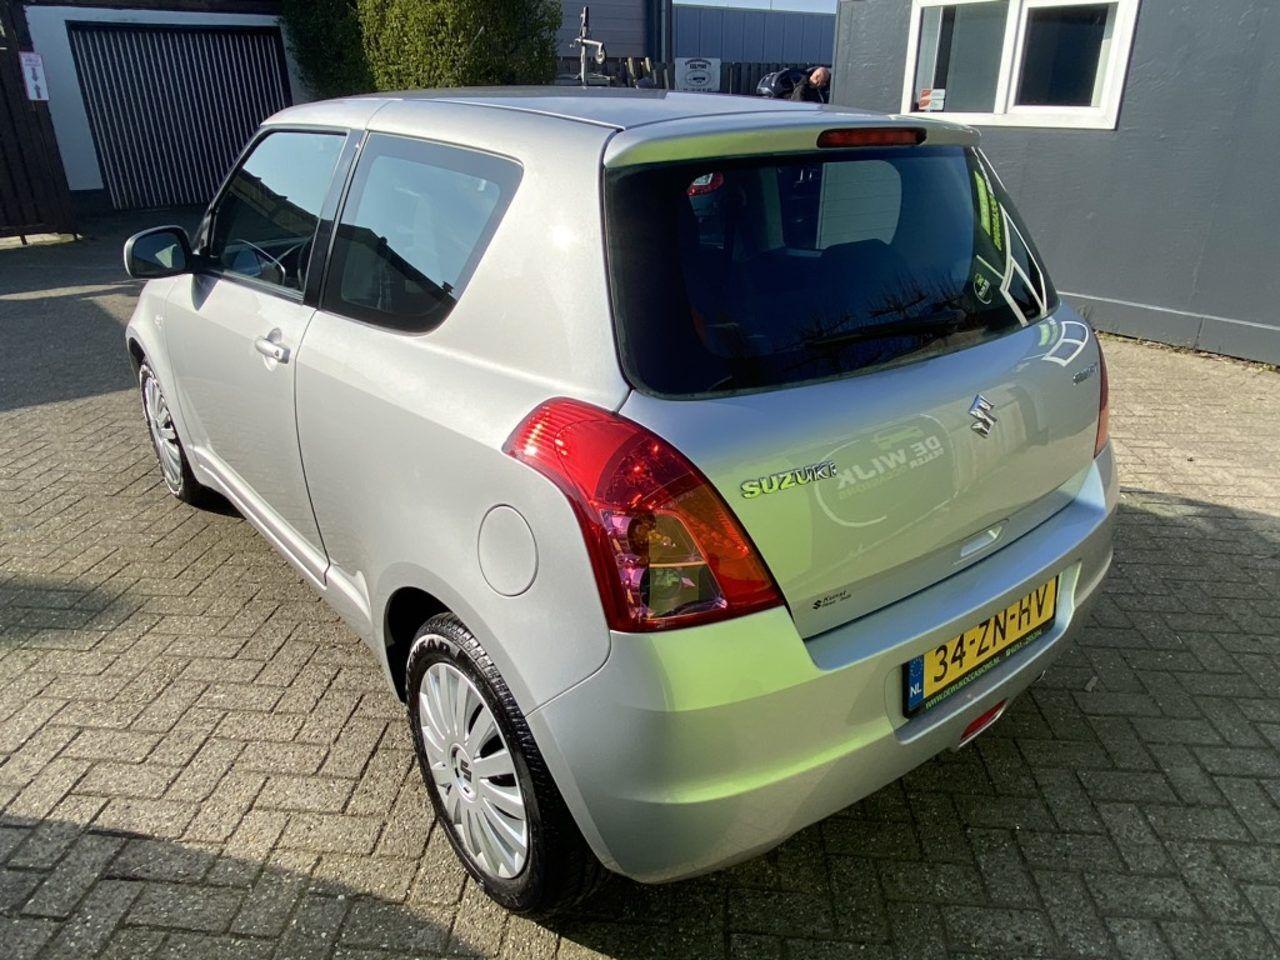 Suzuki Swift за 7000 евро